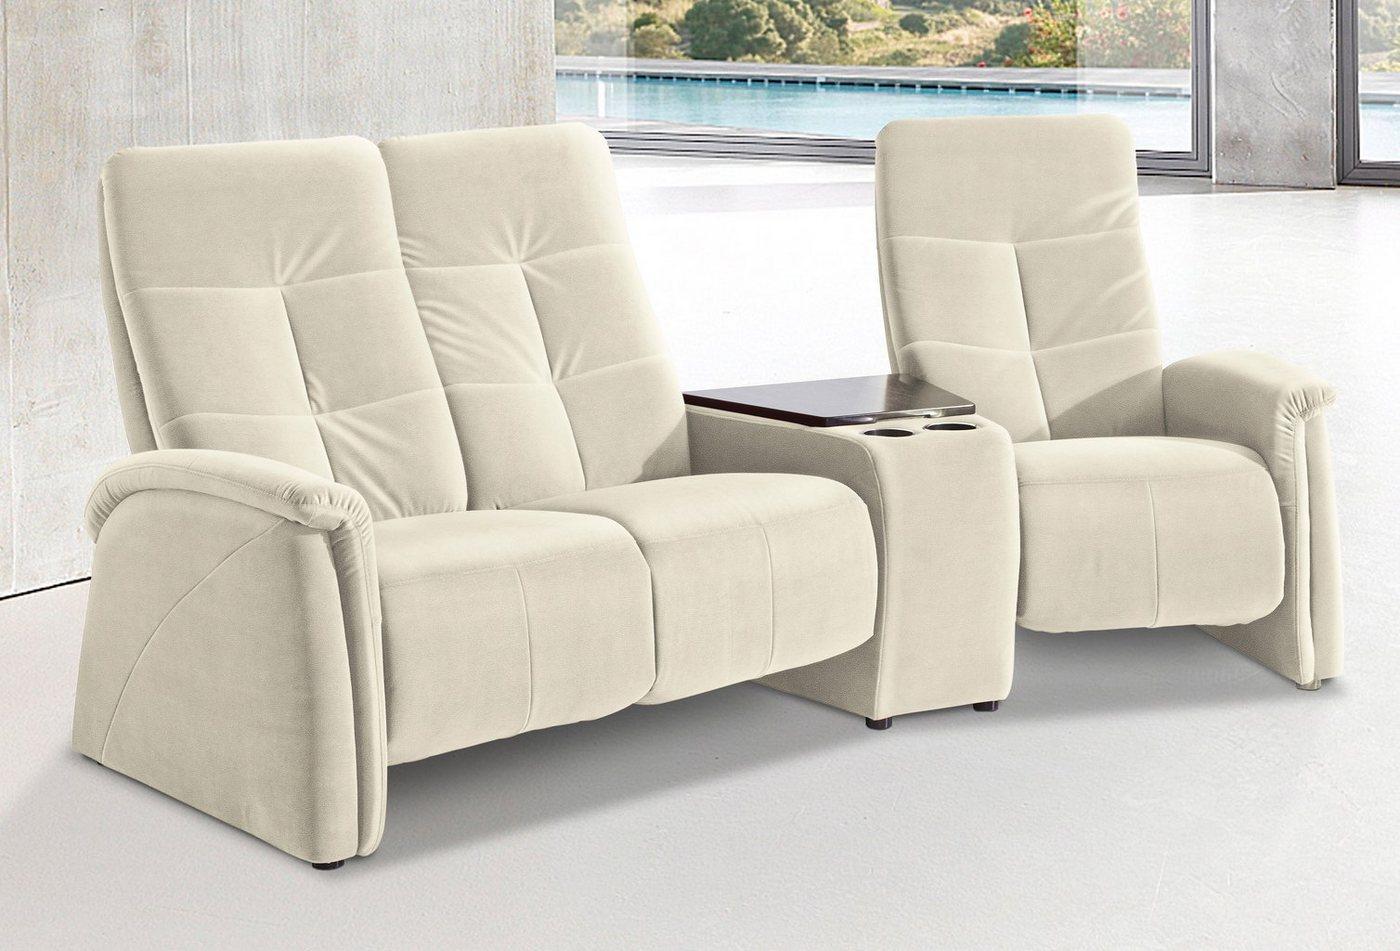 3 sitzer sofas mit relaxfunktion preisvergleiche. Black Bedroom Furniture Sets. Home Design Ideas